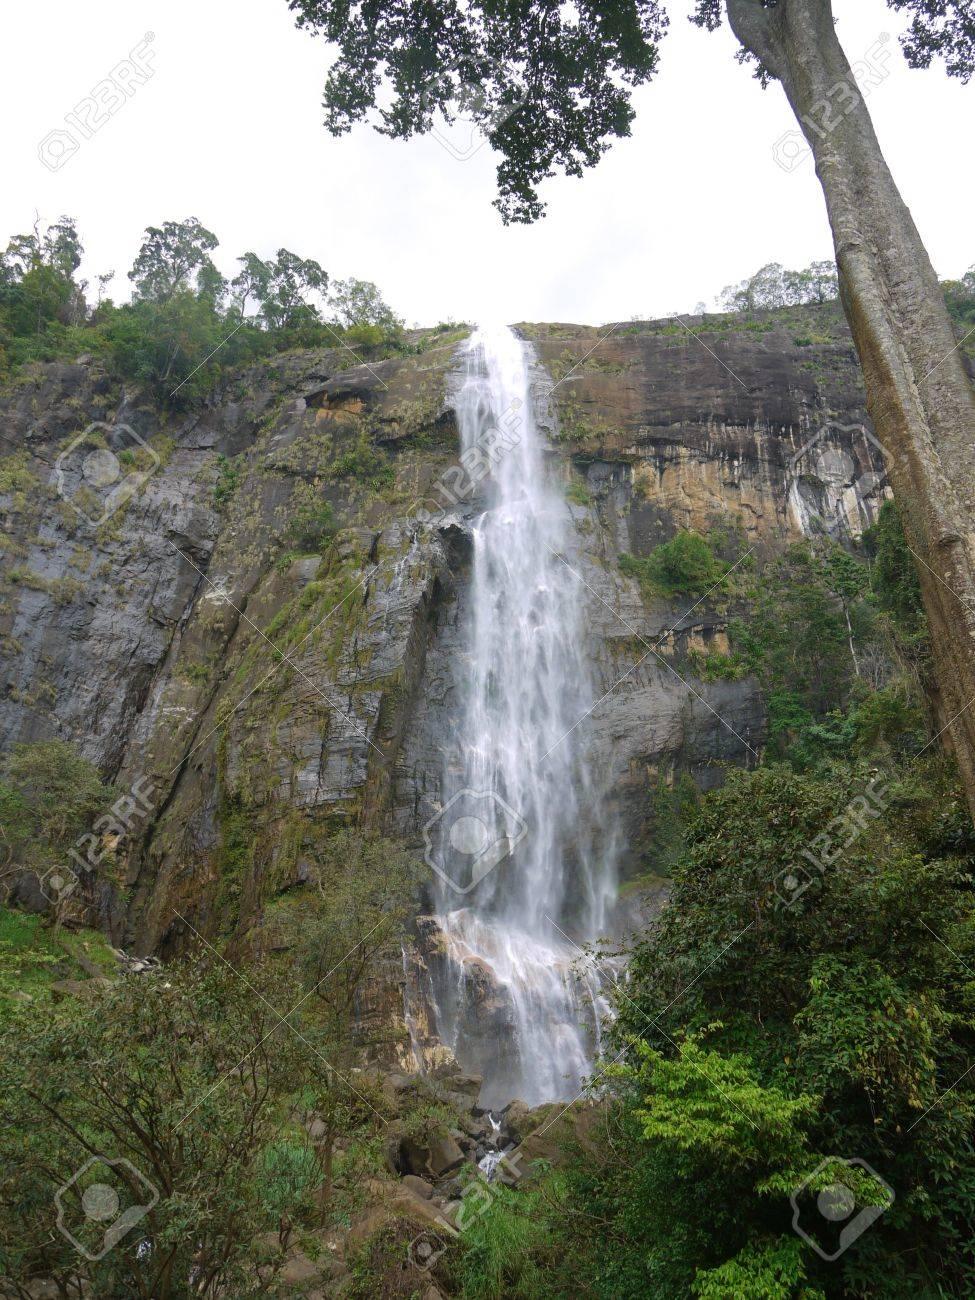 The diyaluma waterfalls in the surroundings of Ella in Sri Lanka Stock Photo - 18233566